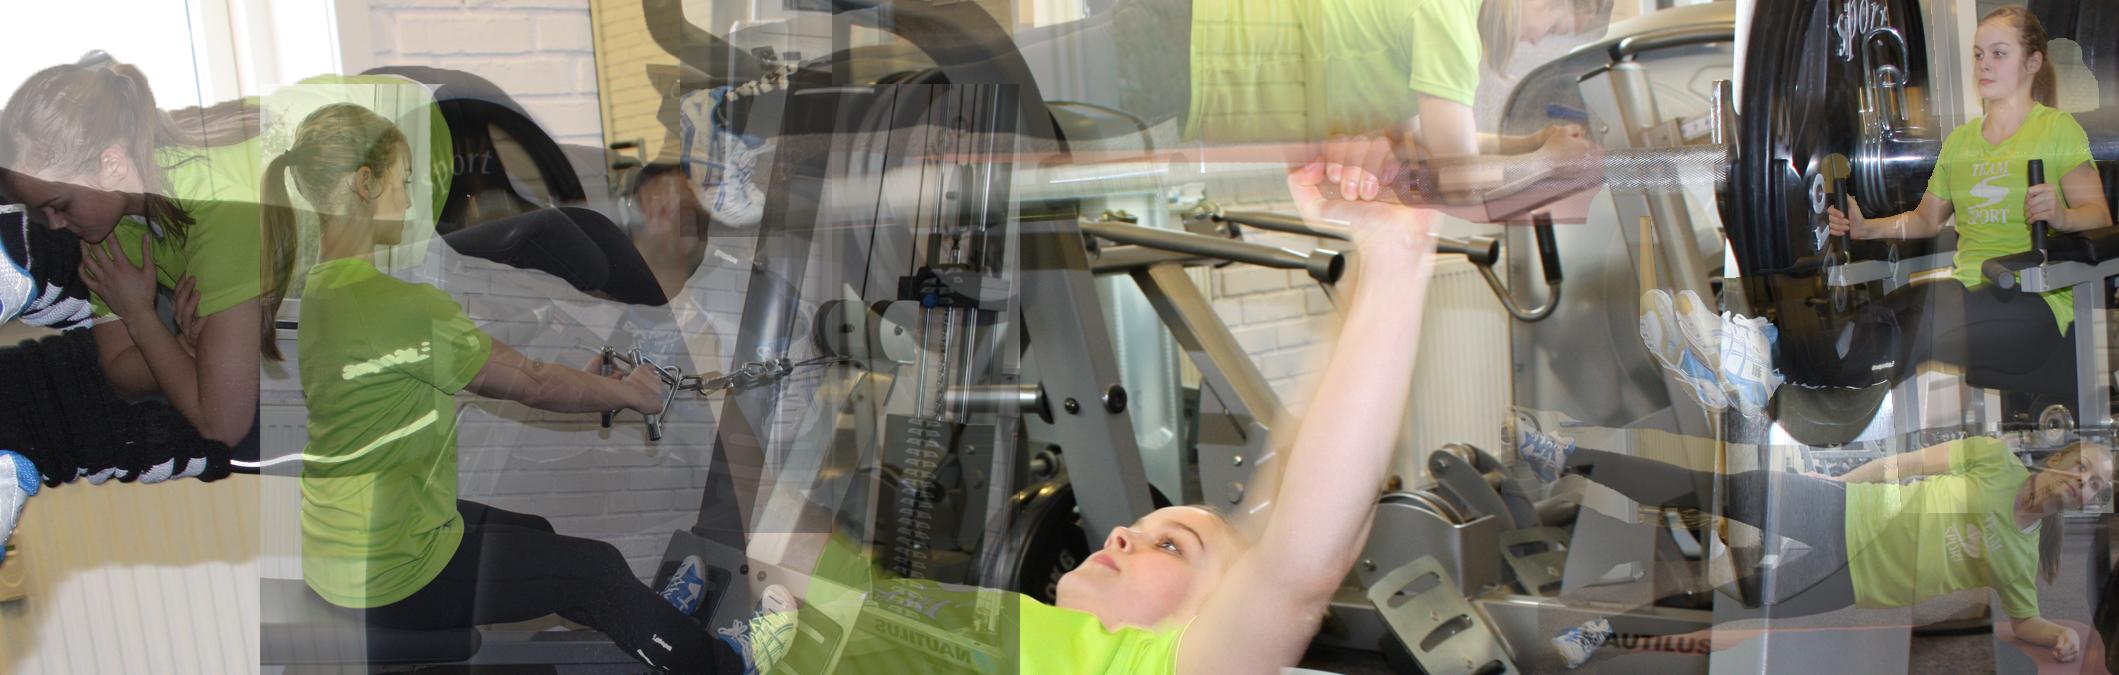 Træning i fitness-rum